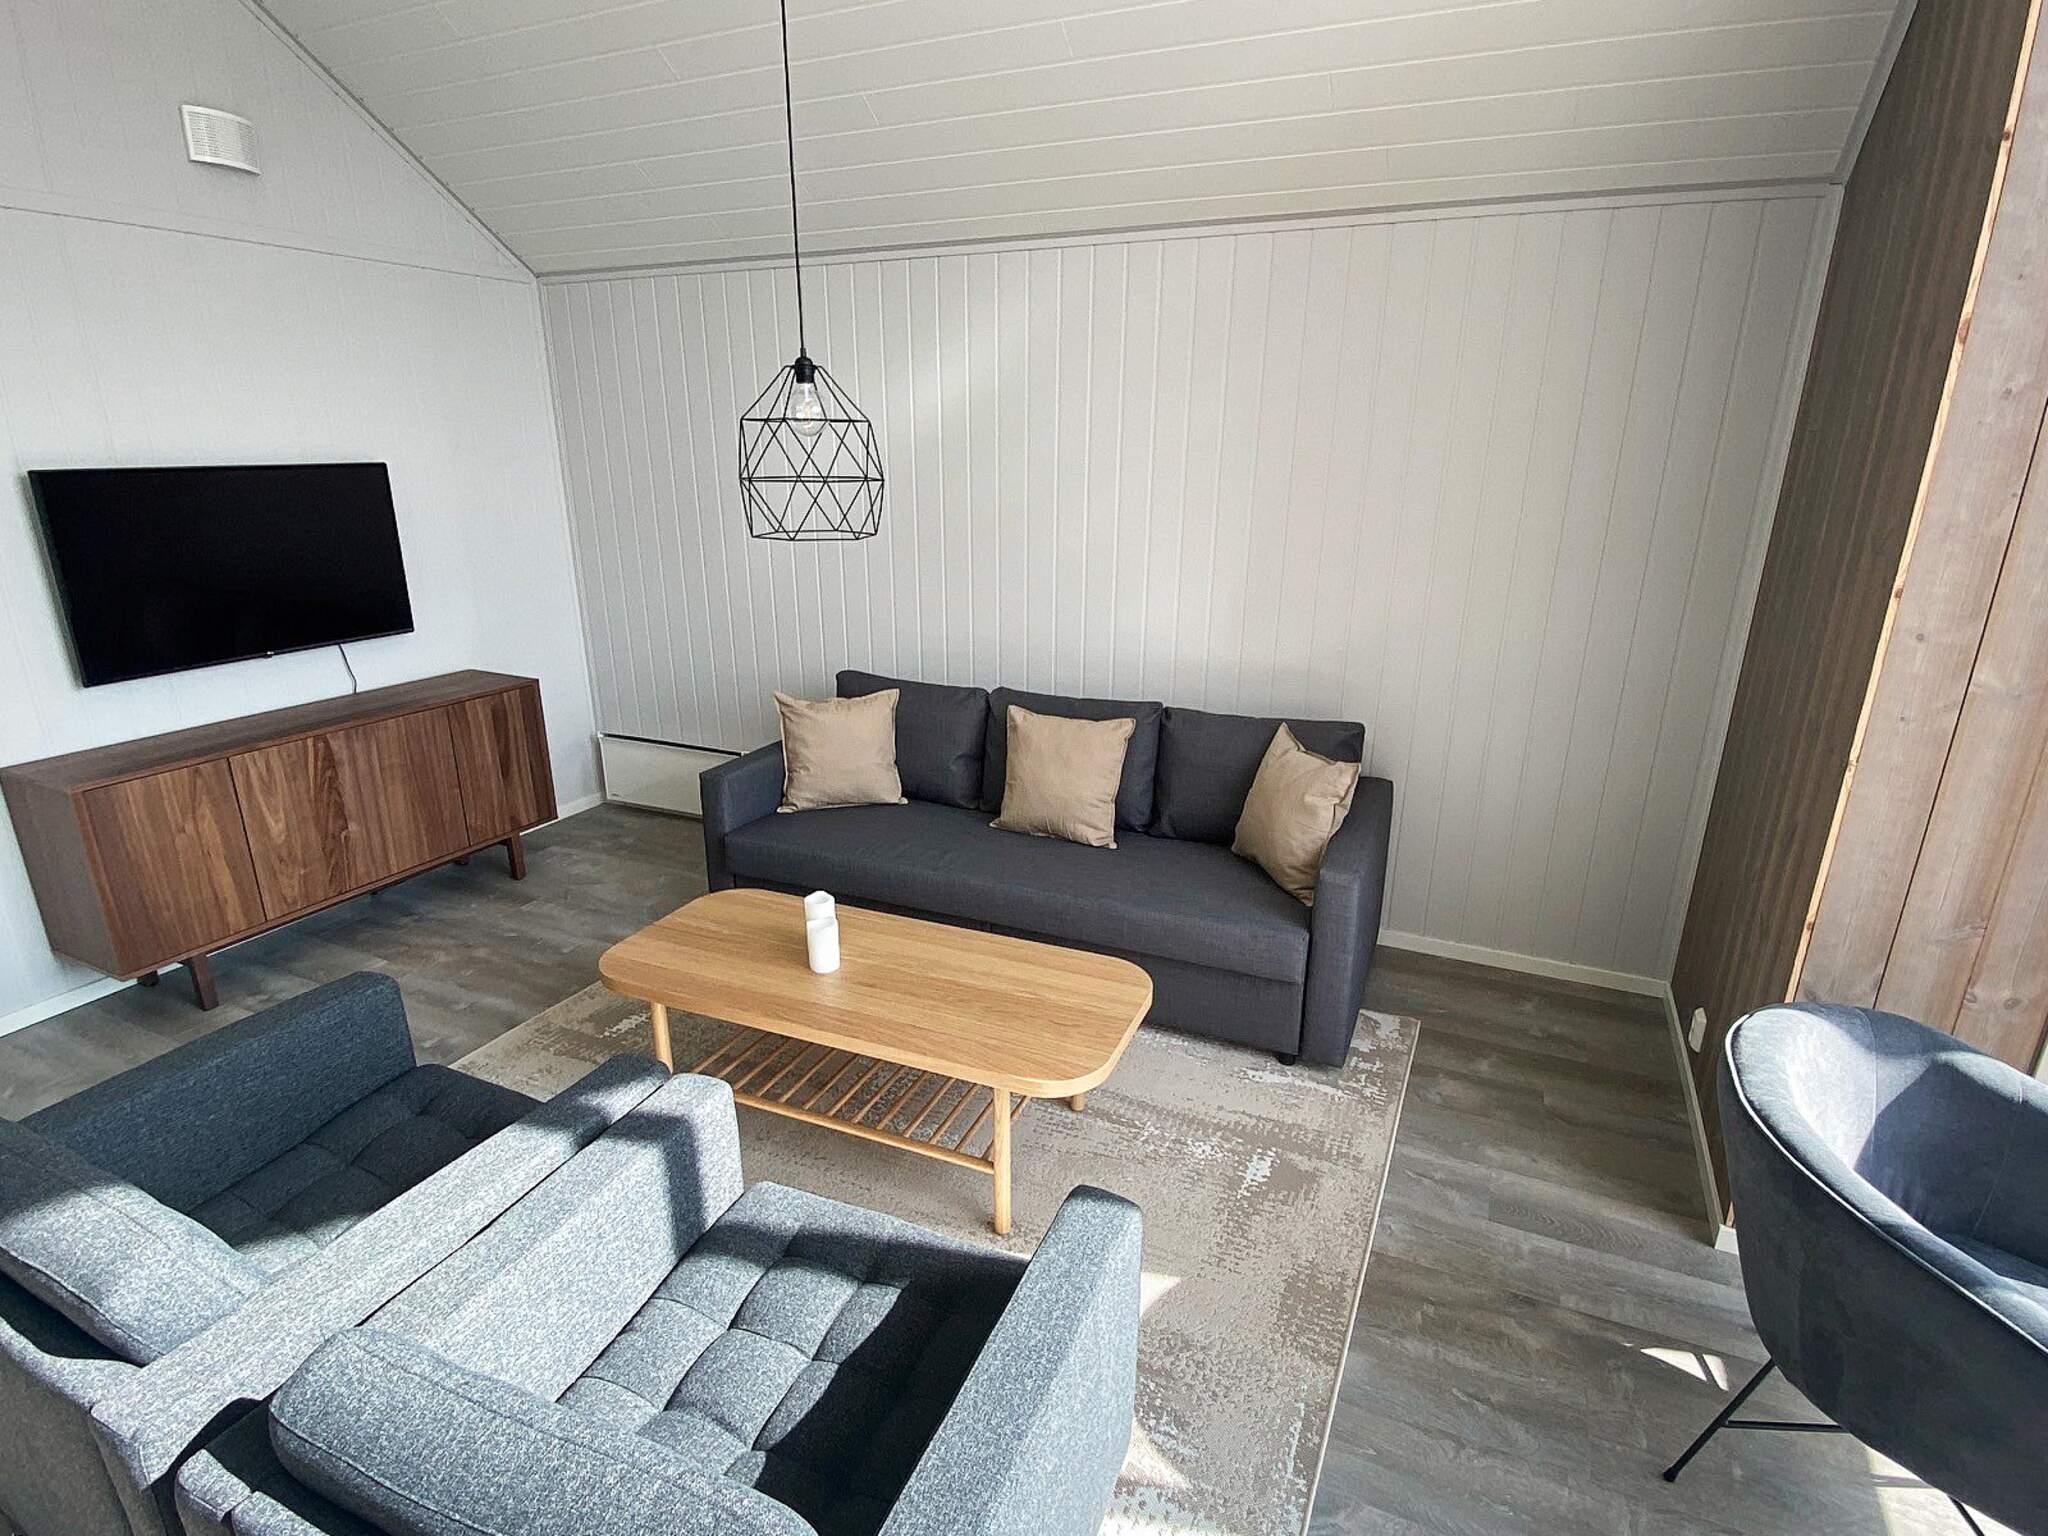 Ferienhaus Sandøy (2789401), Sandøy, More - Romsdal, Westnorwegen, Norwegen, Bild 3